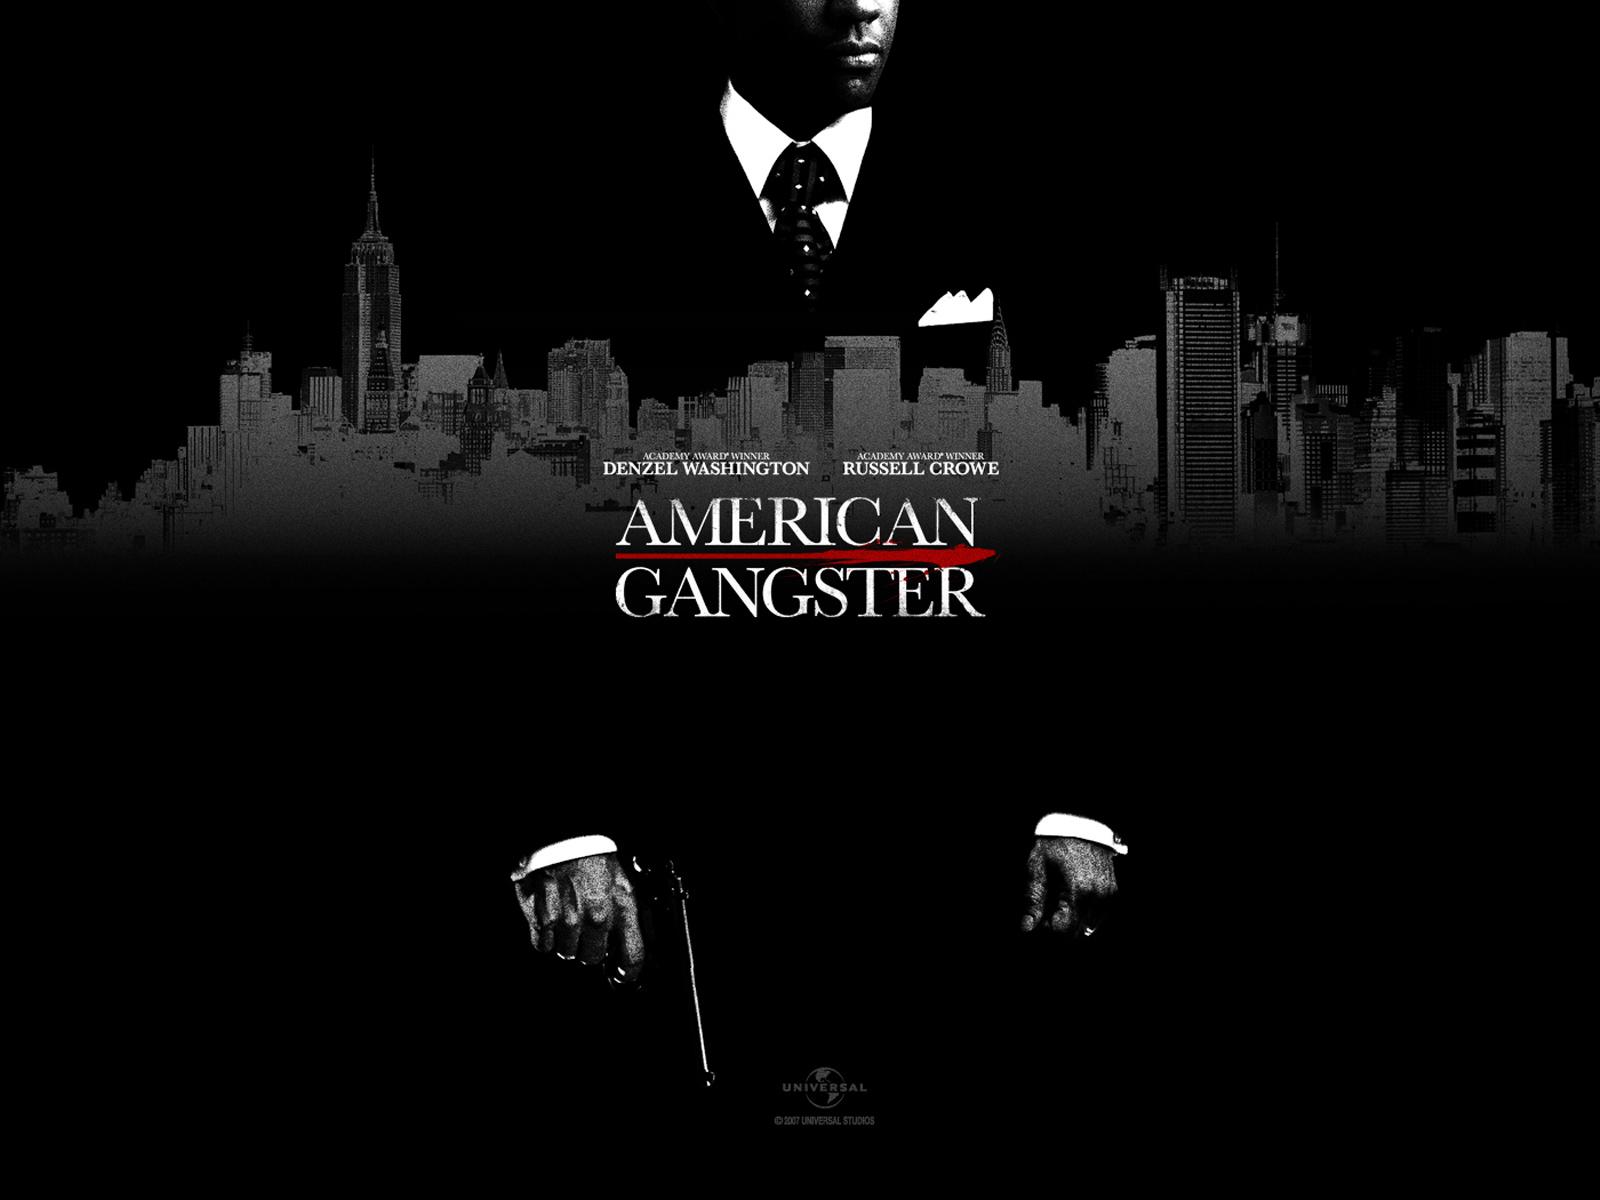 http://4.bp.blogspot.com/-txGcvjRp_P4/UBva6FFGBsI/AAAAAAAAAYY/YMuUp8KOKtY/s1600/american-gangster_0002.jpg